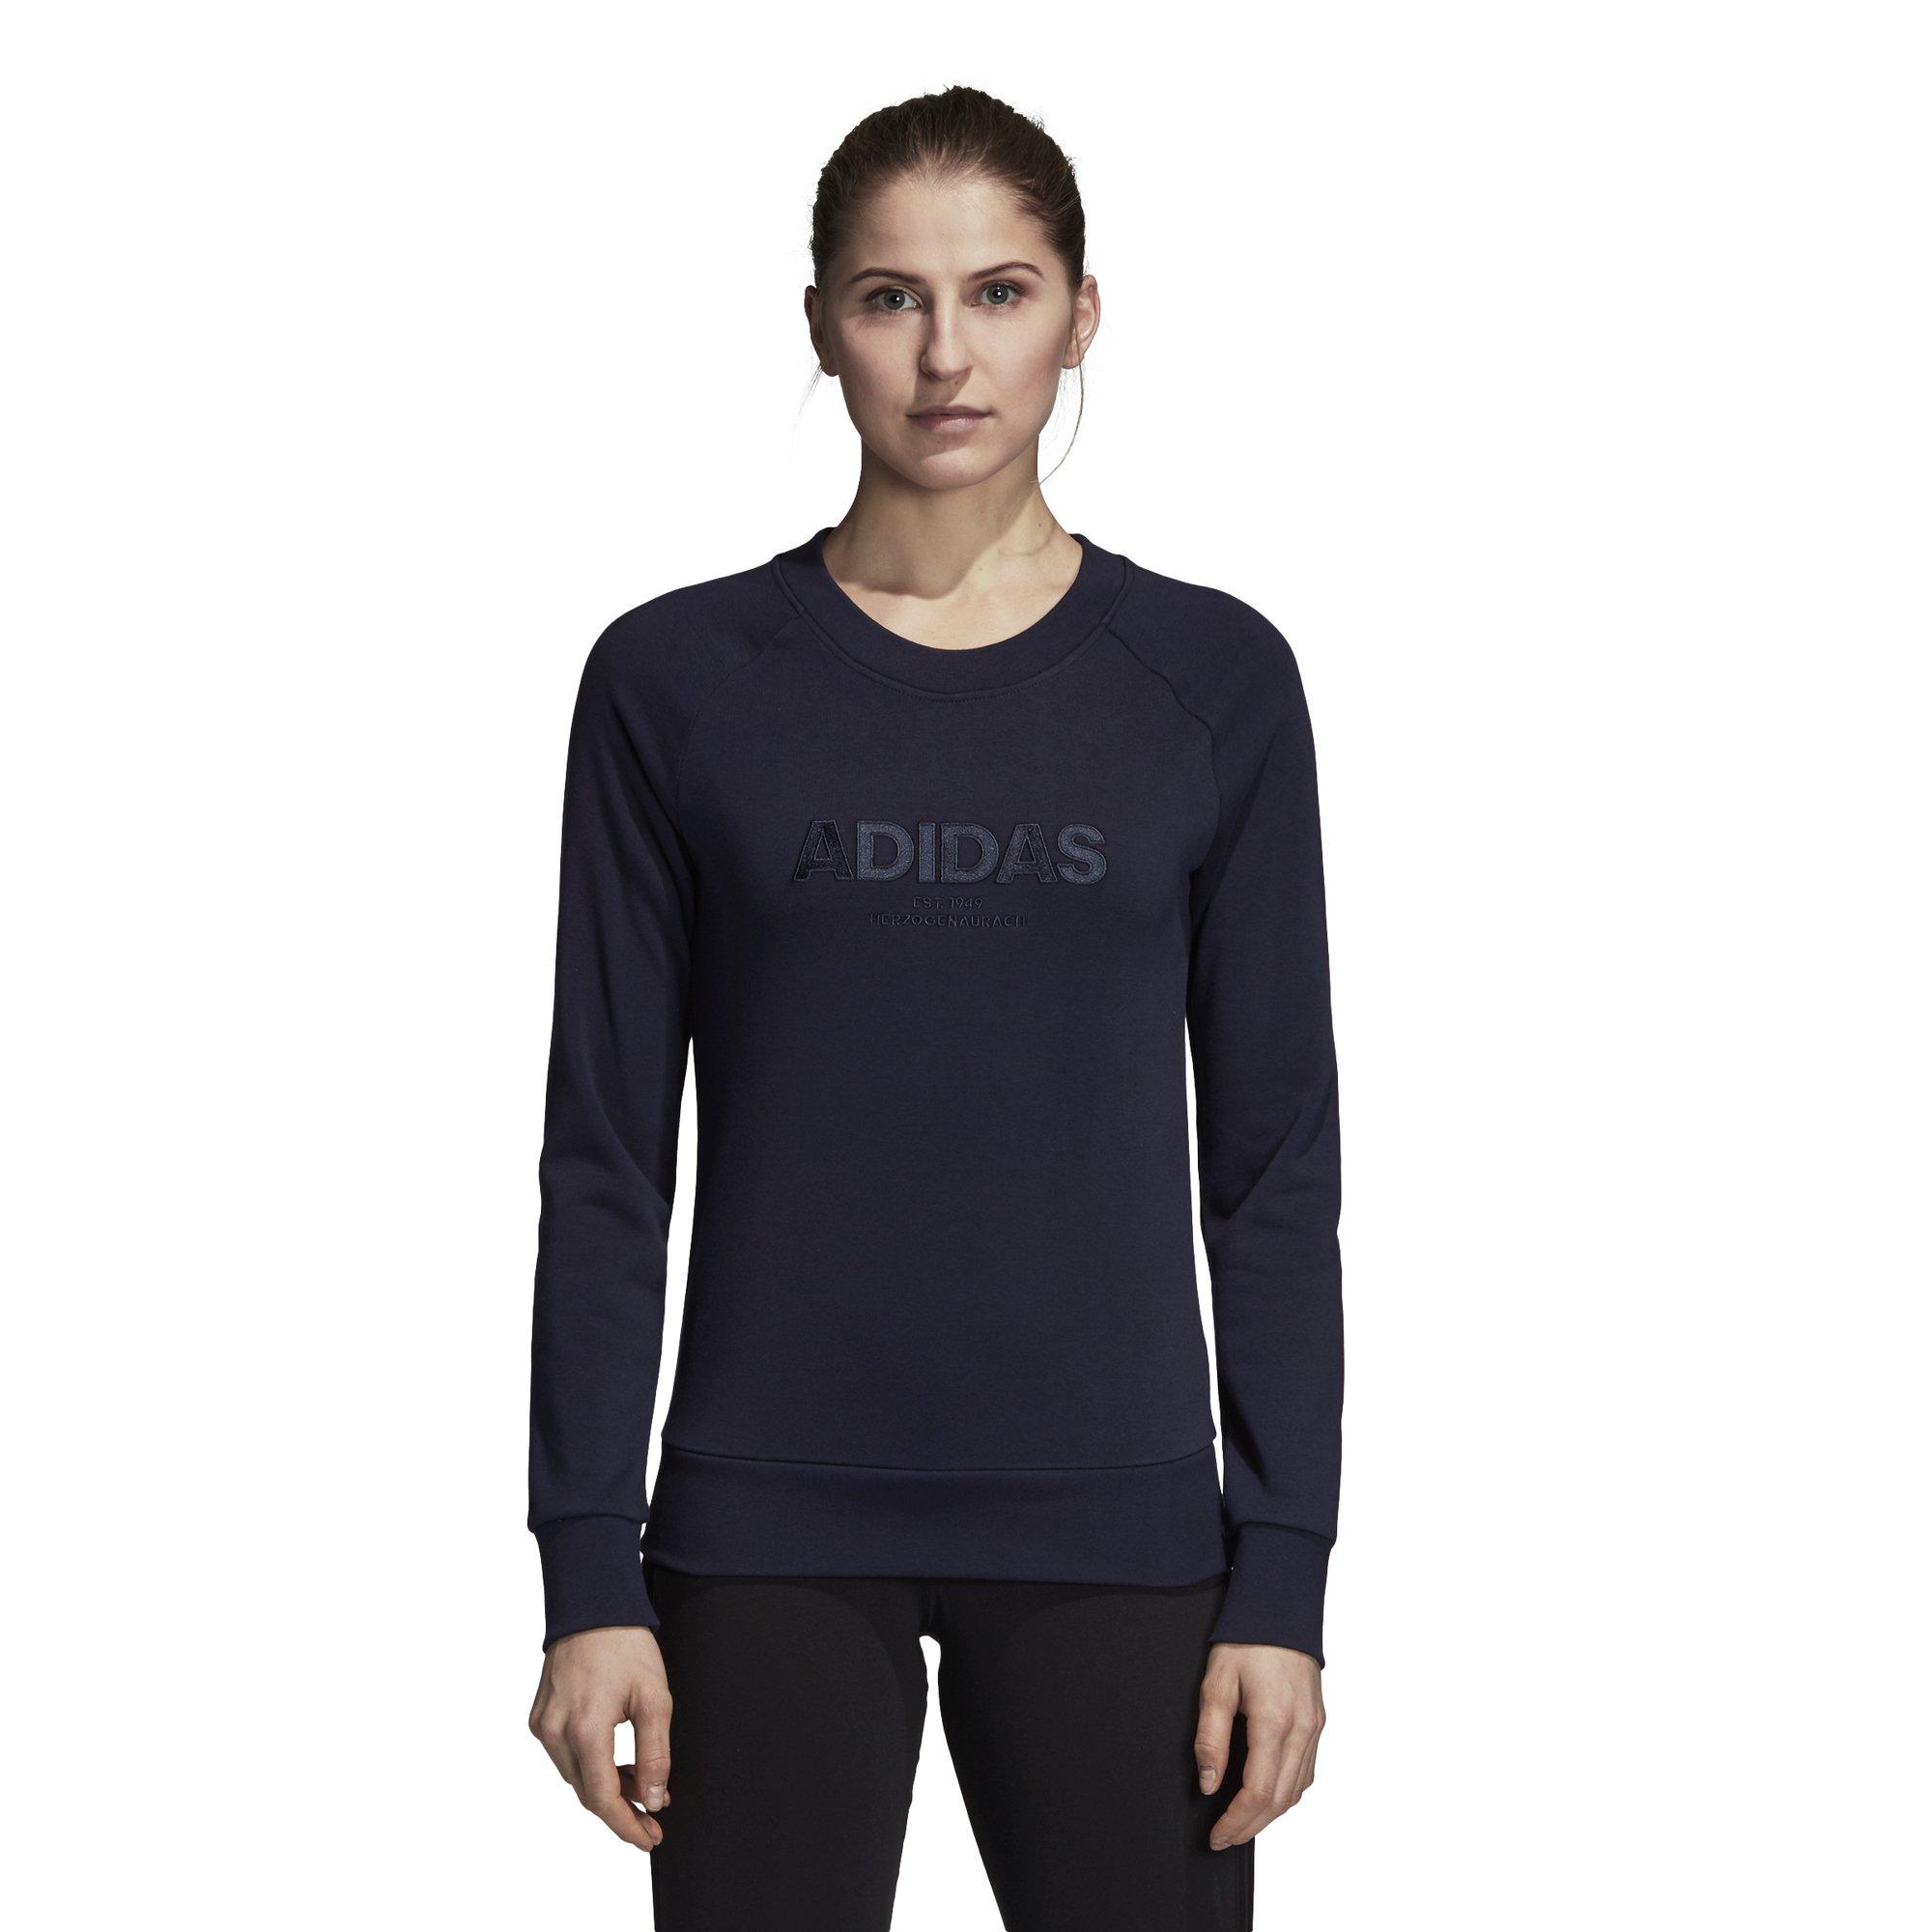 adidas Women's Essentials Allcap Sports Sweater, Variety (Legink, M) by adidas